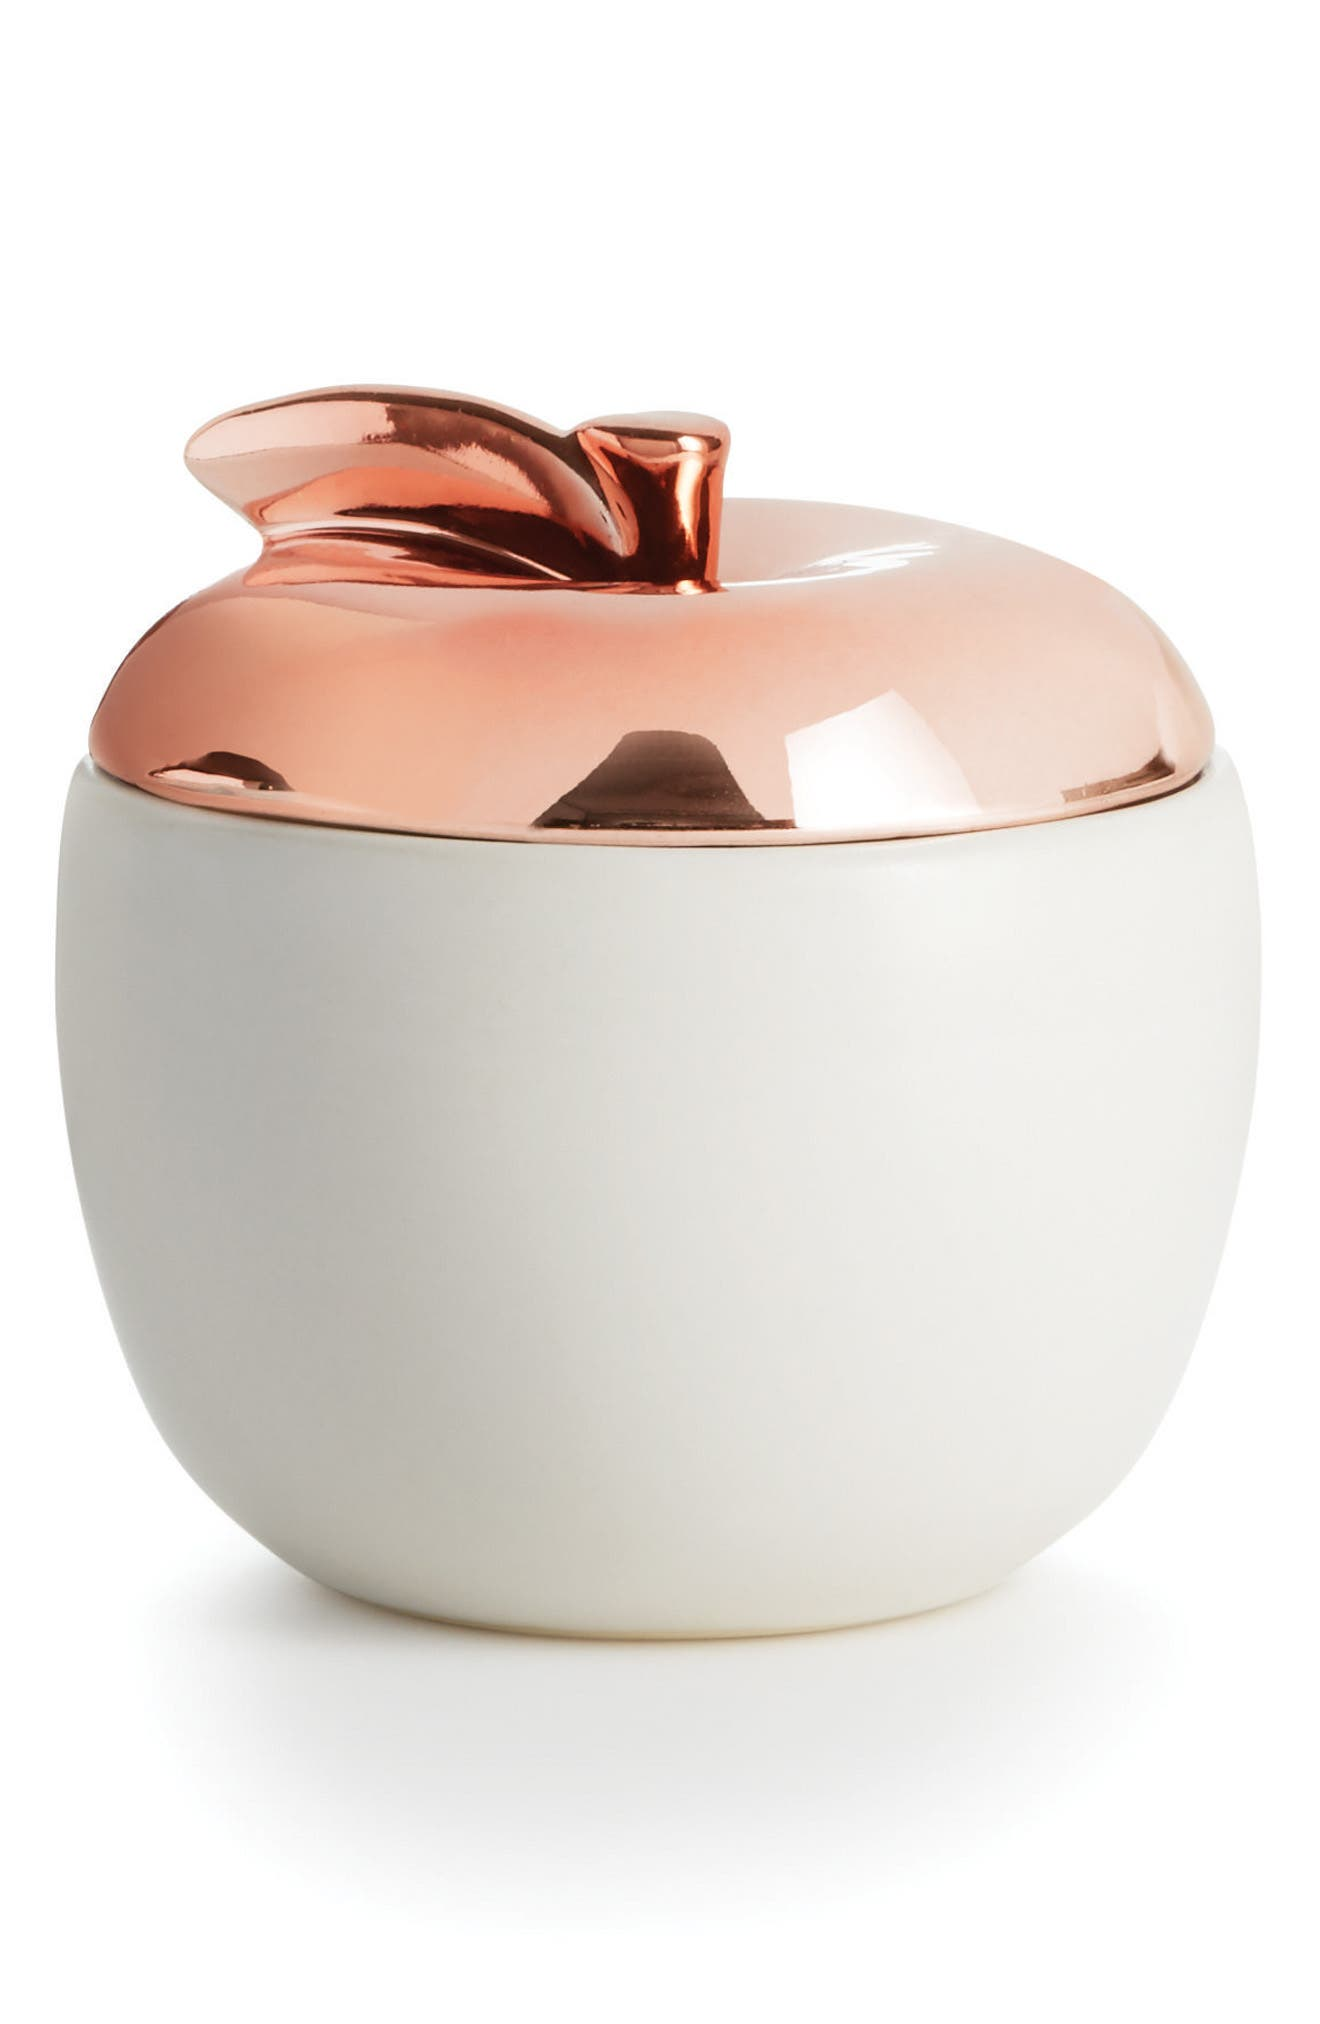 Alternate Image 1 Selected - ILLUME® Cider Woods Lidded Ceramic Candle